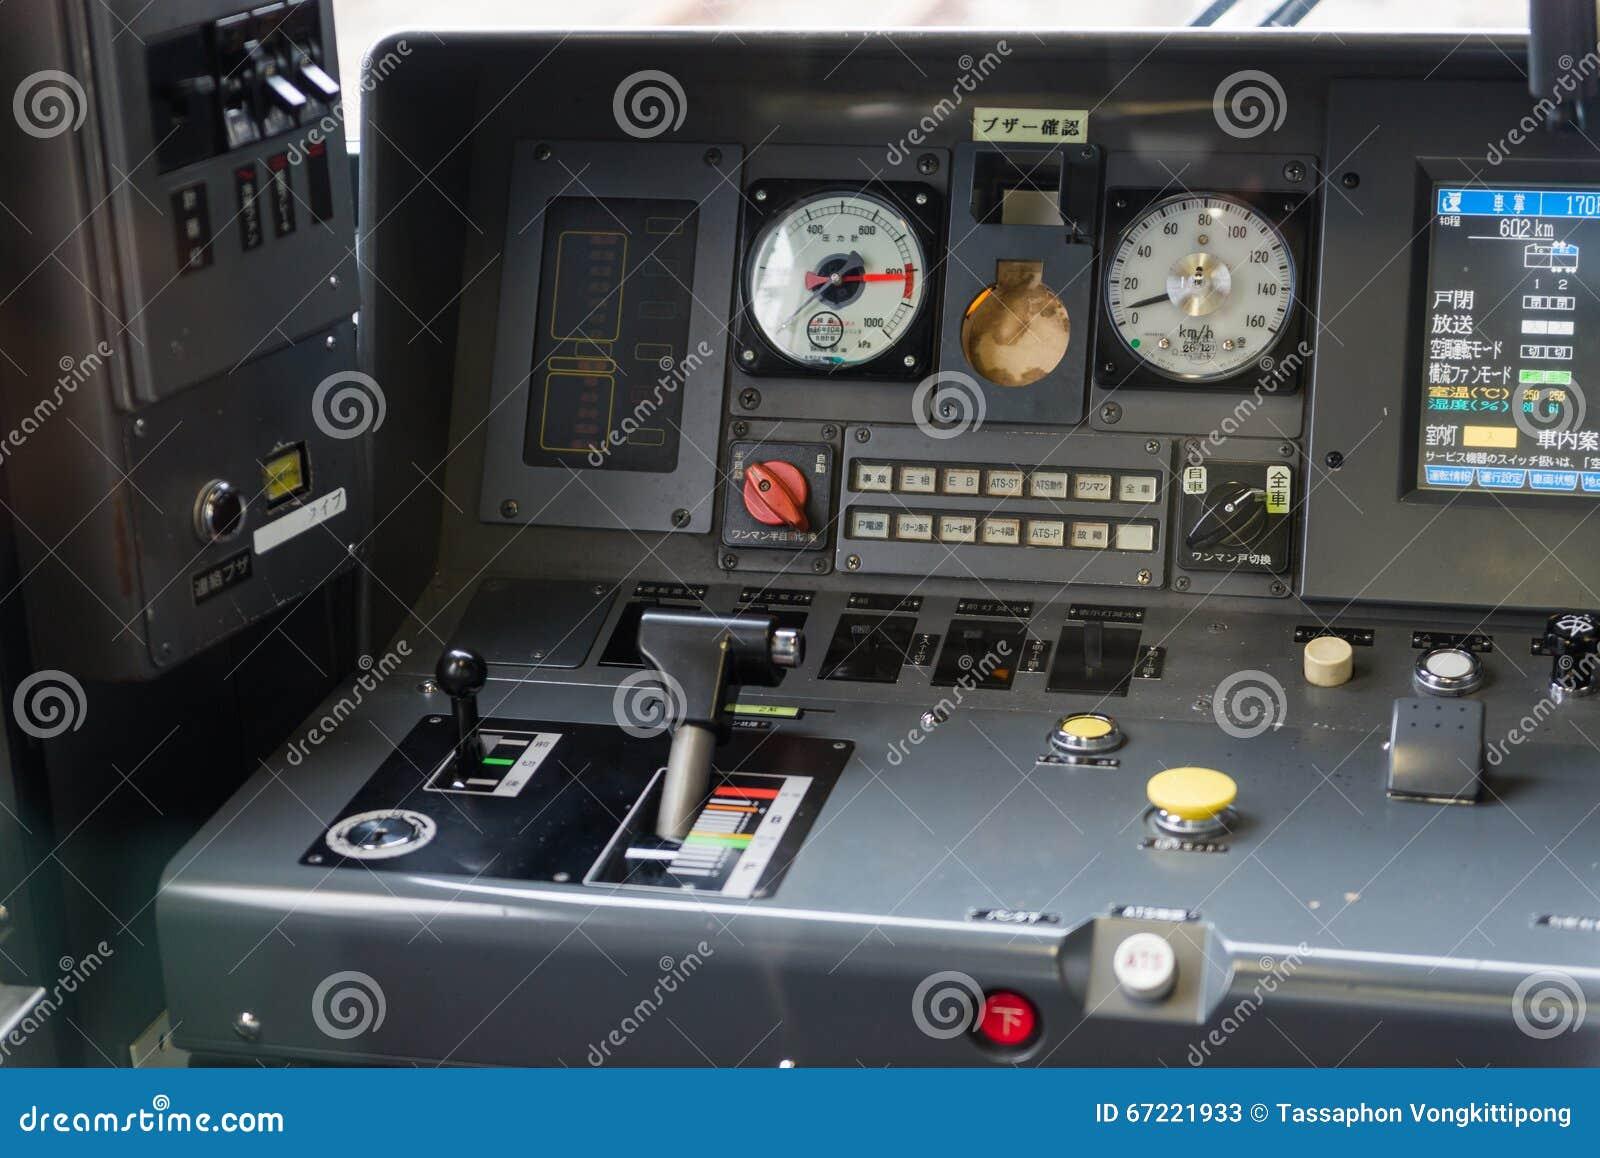 detail interior of japan train controller car dashboard speedometer editorial stock photo. Black Bedroom Furniture Sets. Home Design Ideas